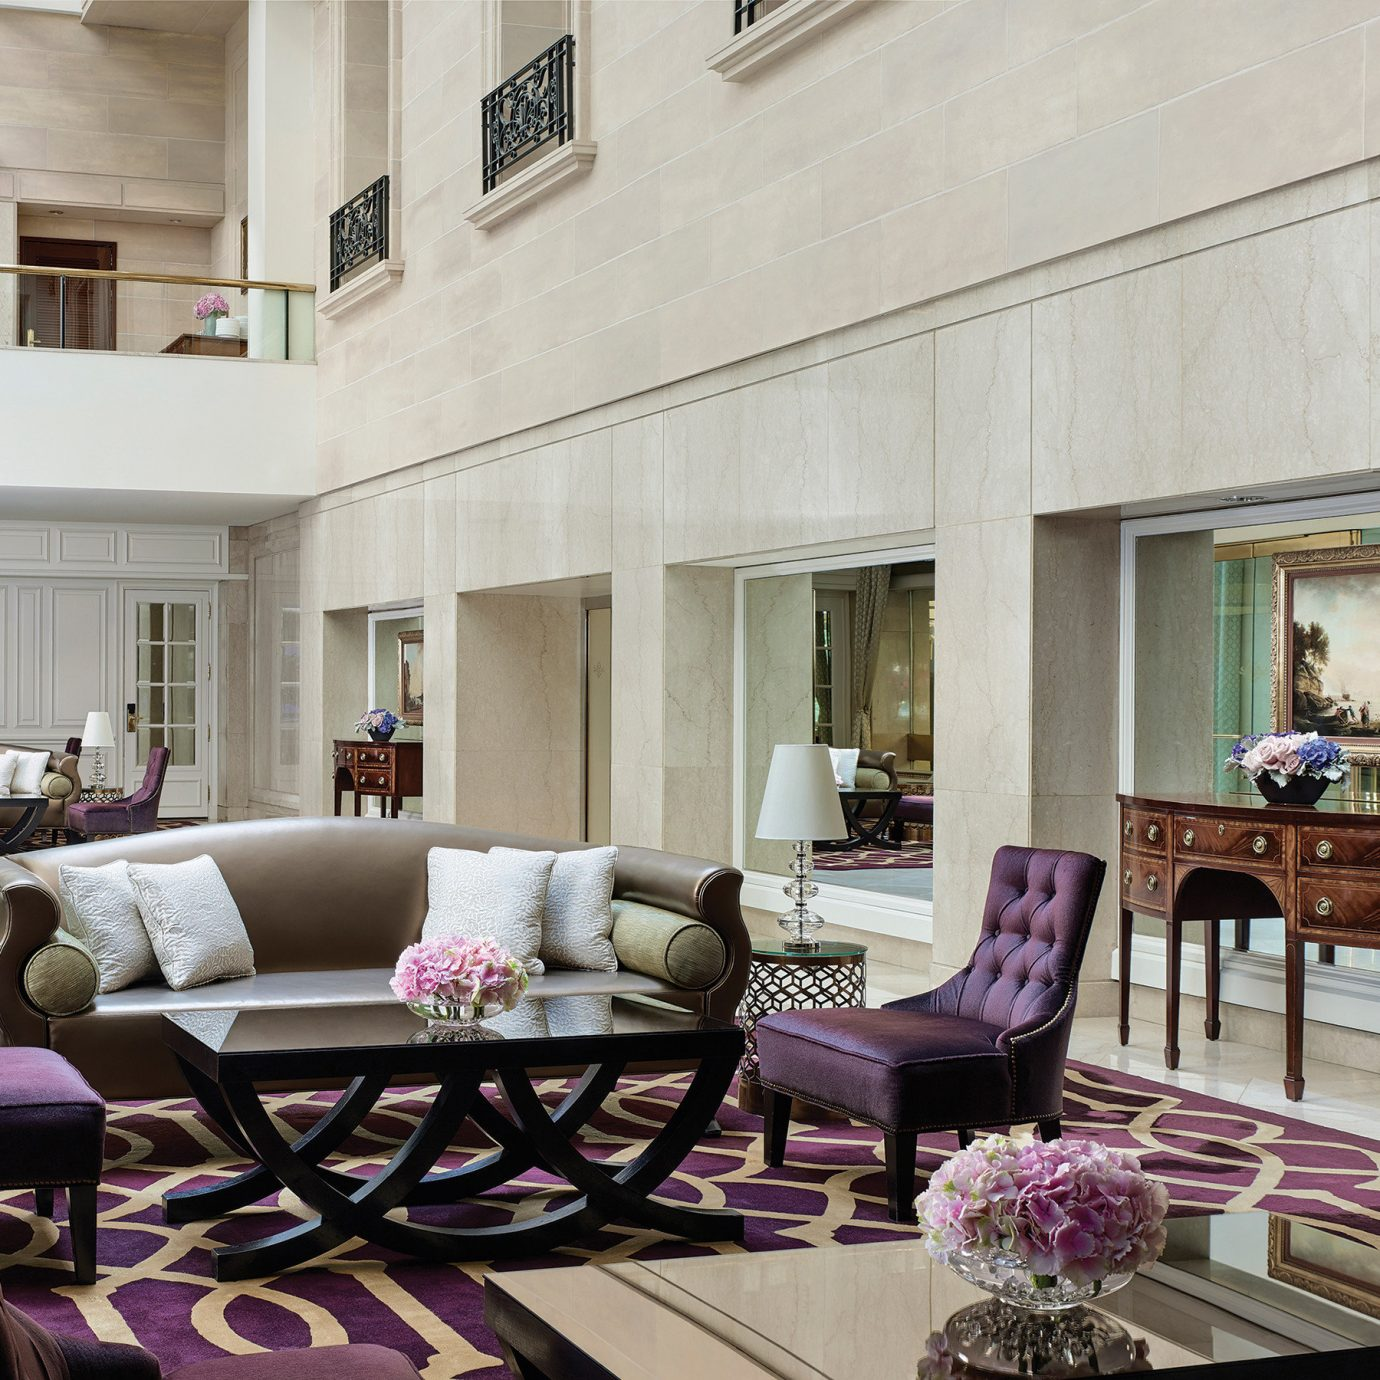 Architecture Bar Classic Cultural Elegant Historic Lobby Lounge Luxury Romance living room property home condominium Villa mansion cottage